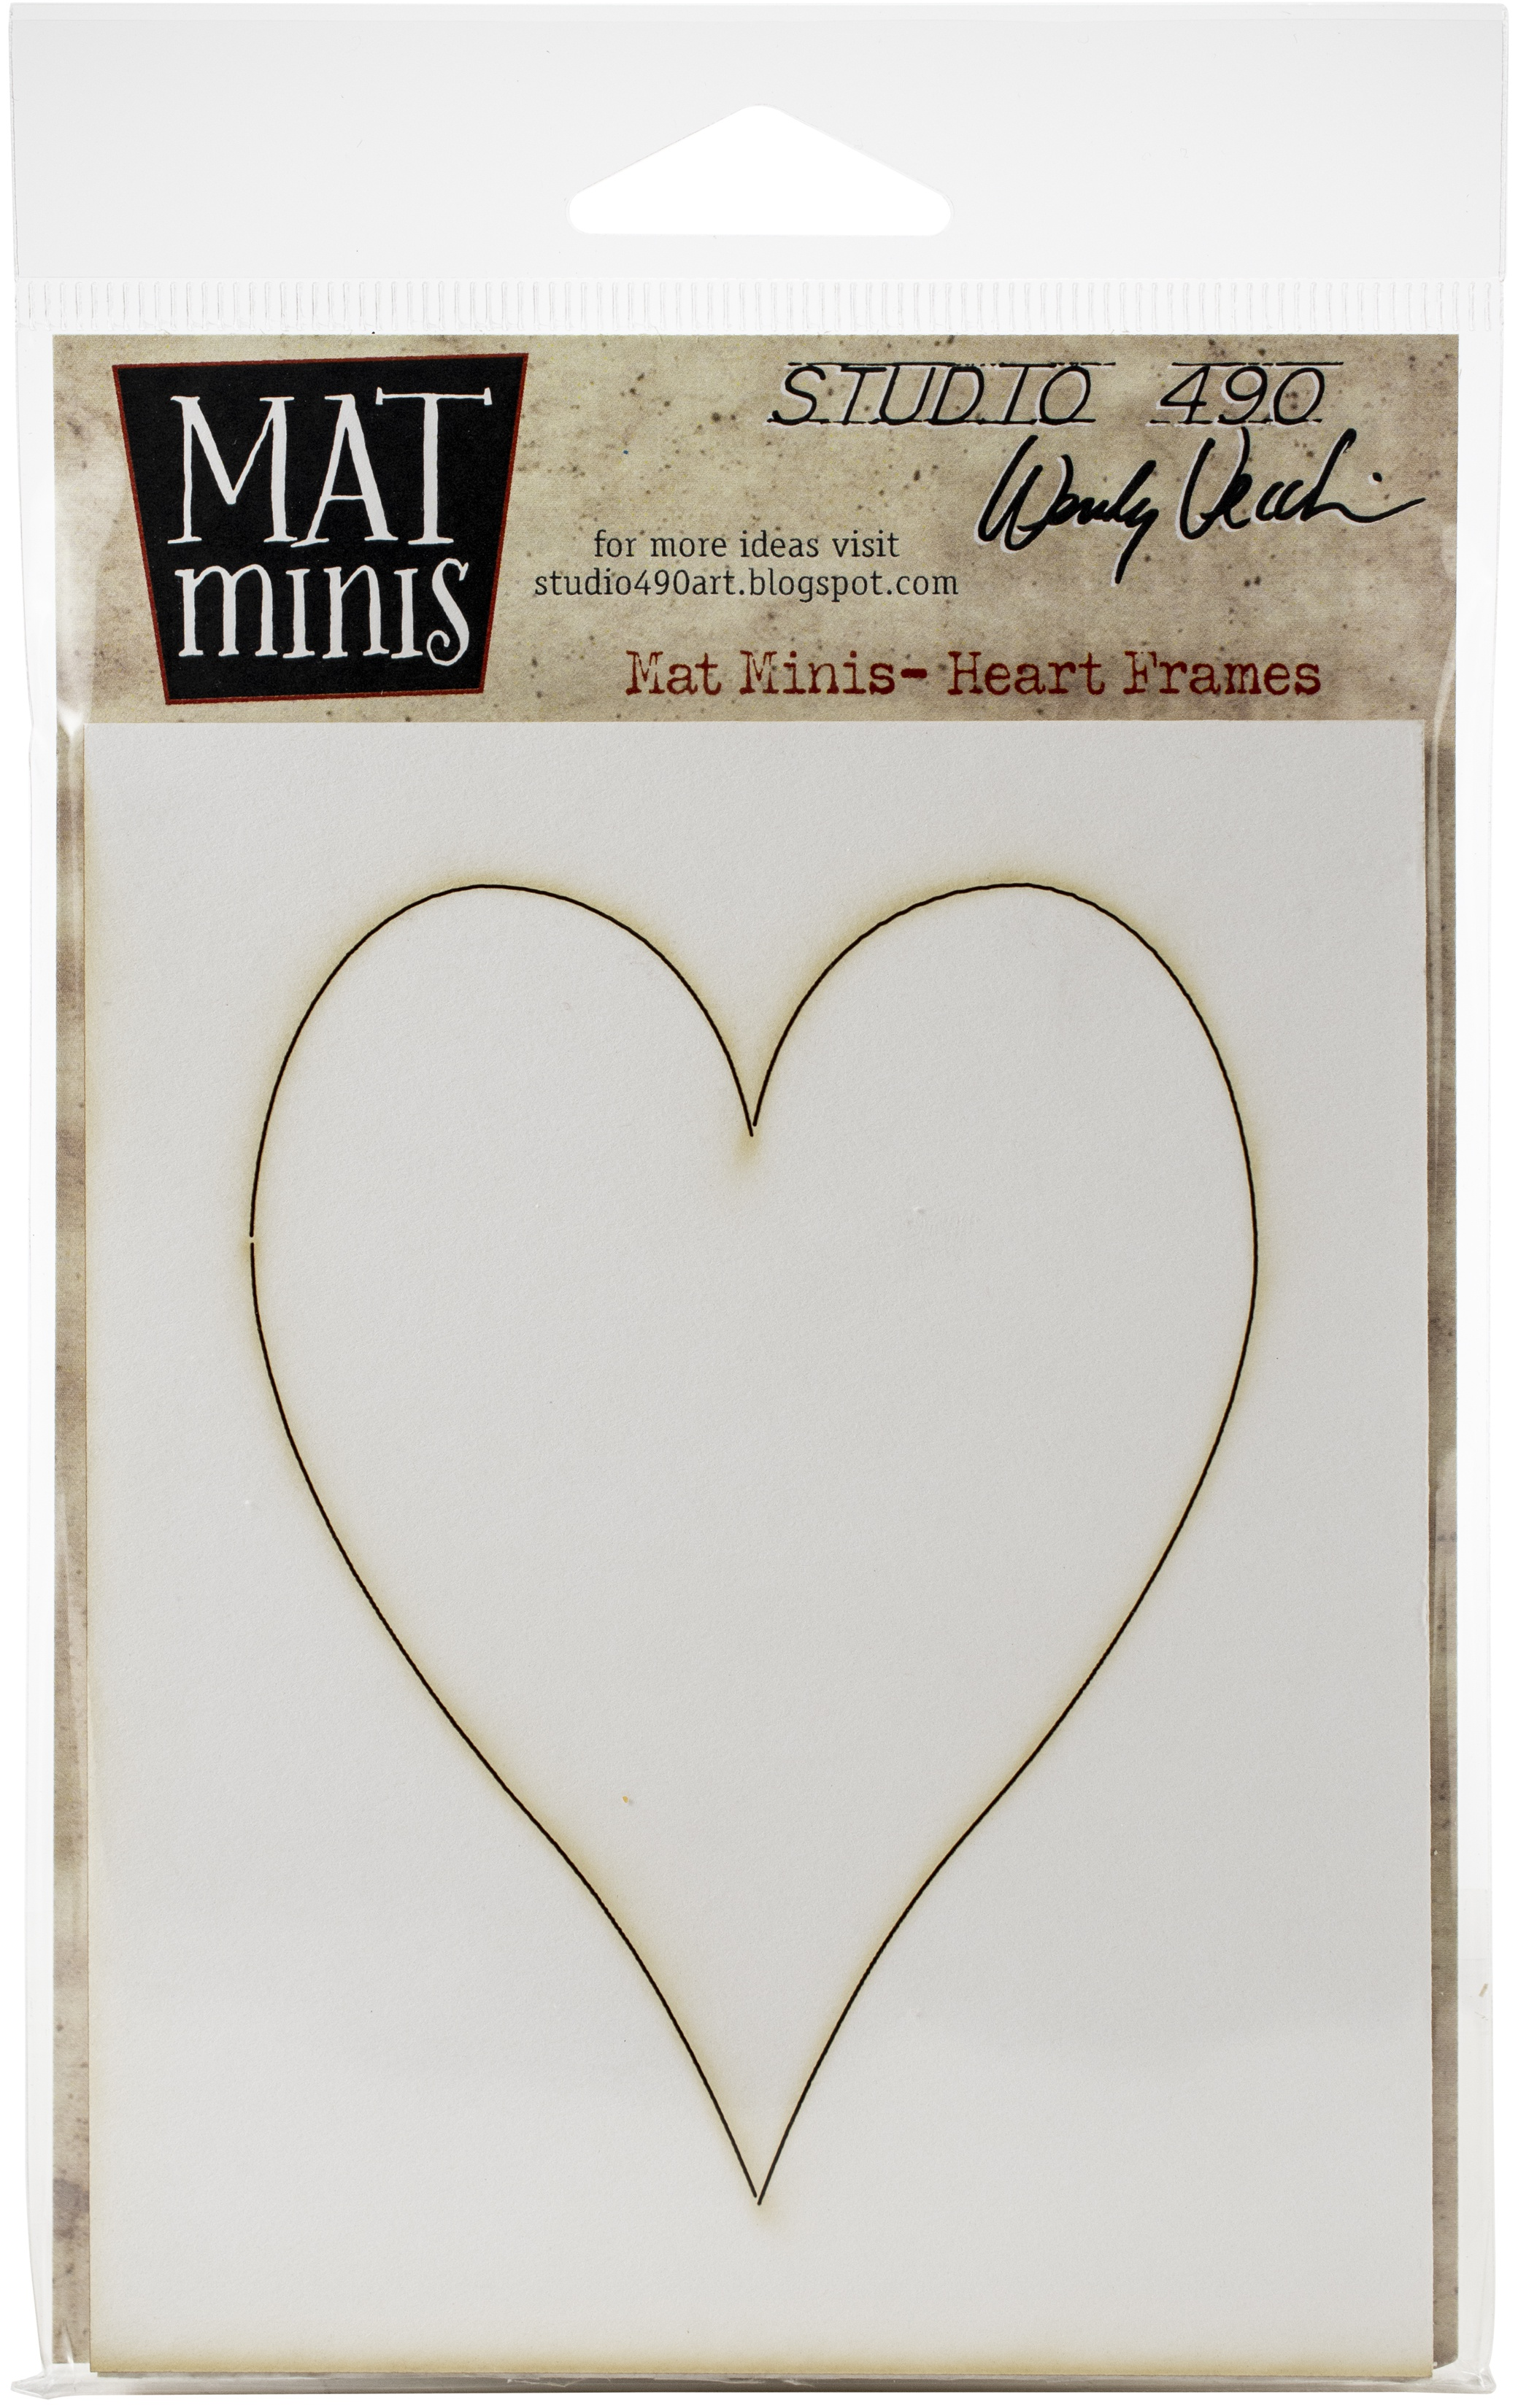 Studio 490 - Wendy Vecchi Laser Cut Mat Minis - Heart Frames